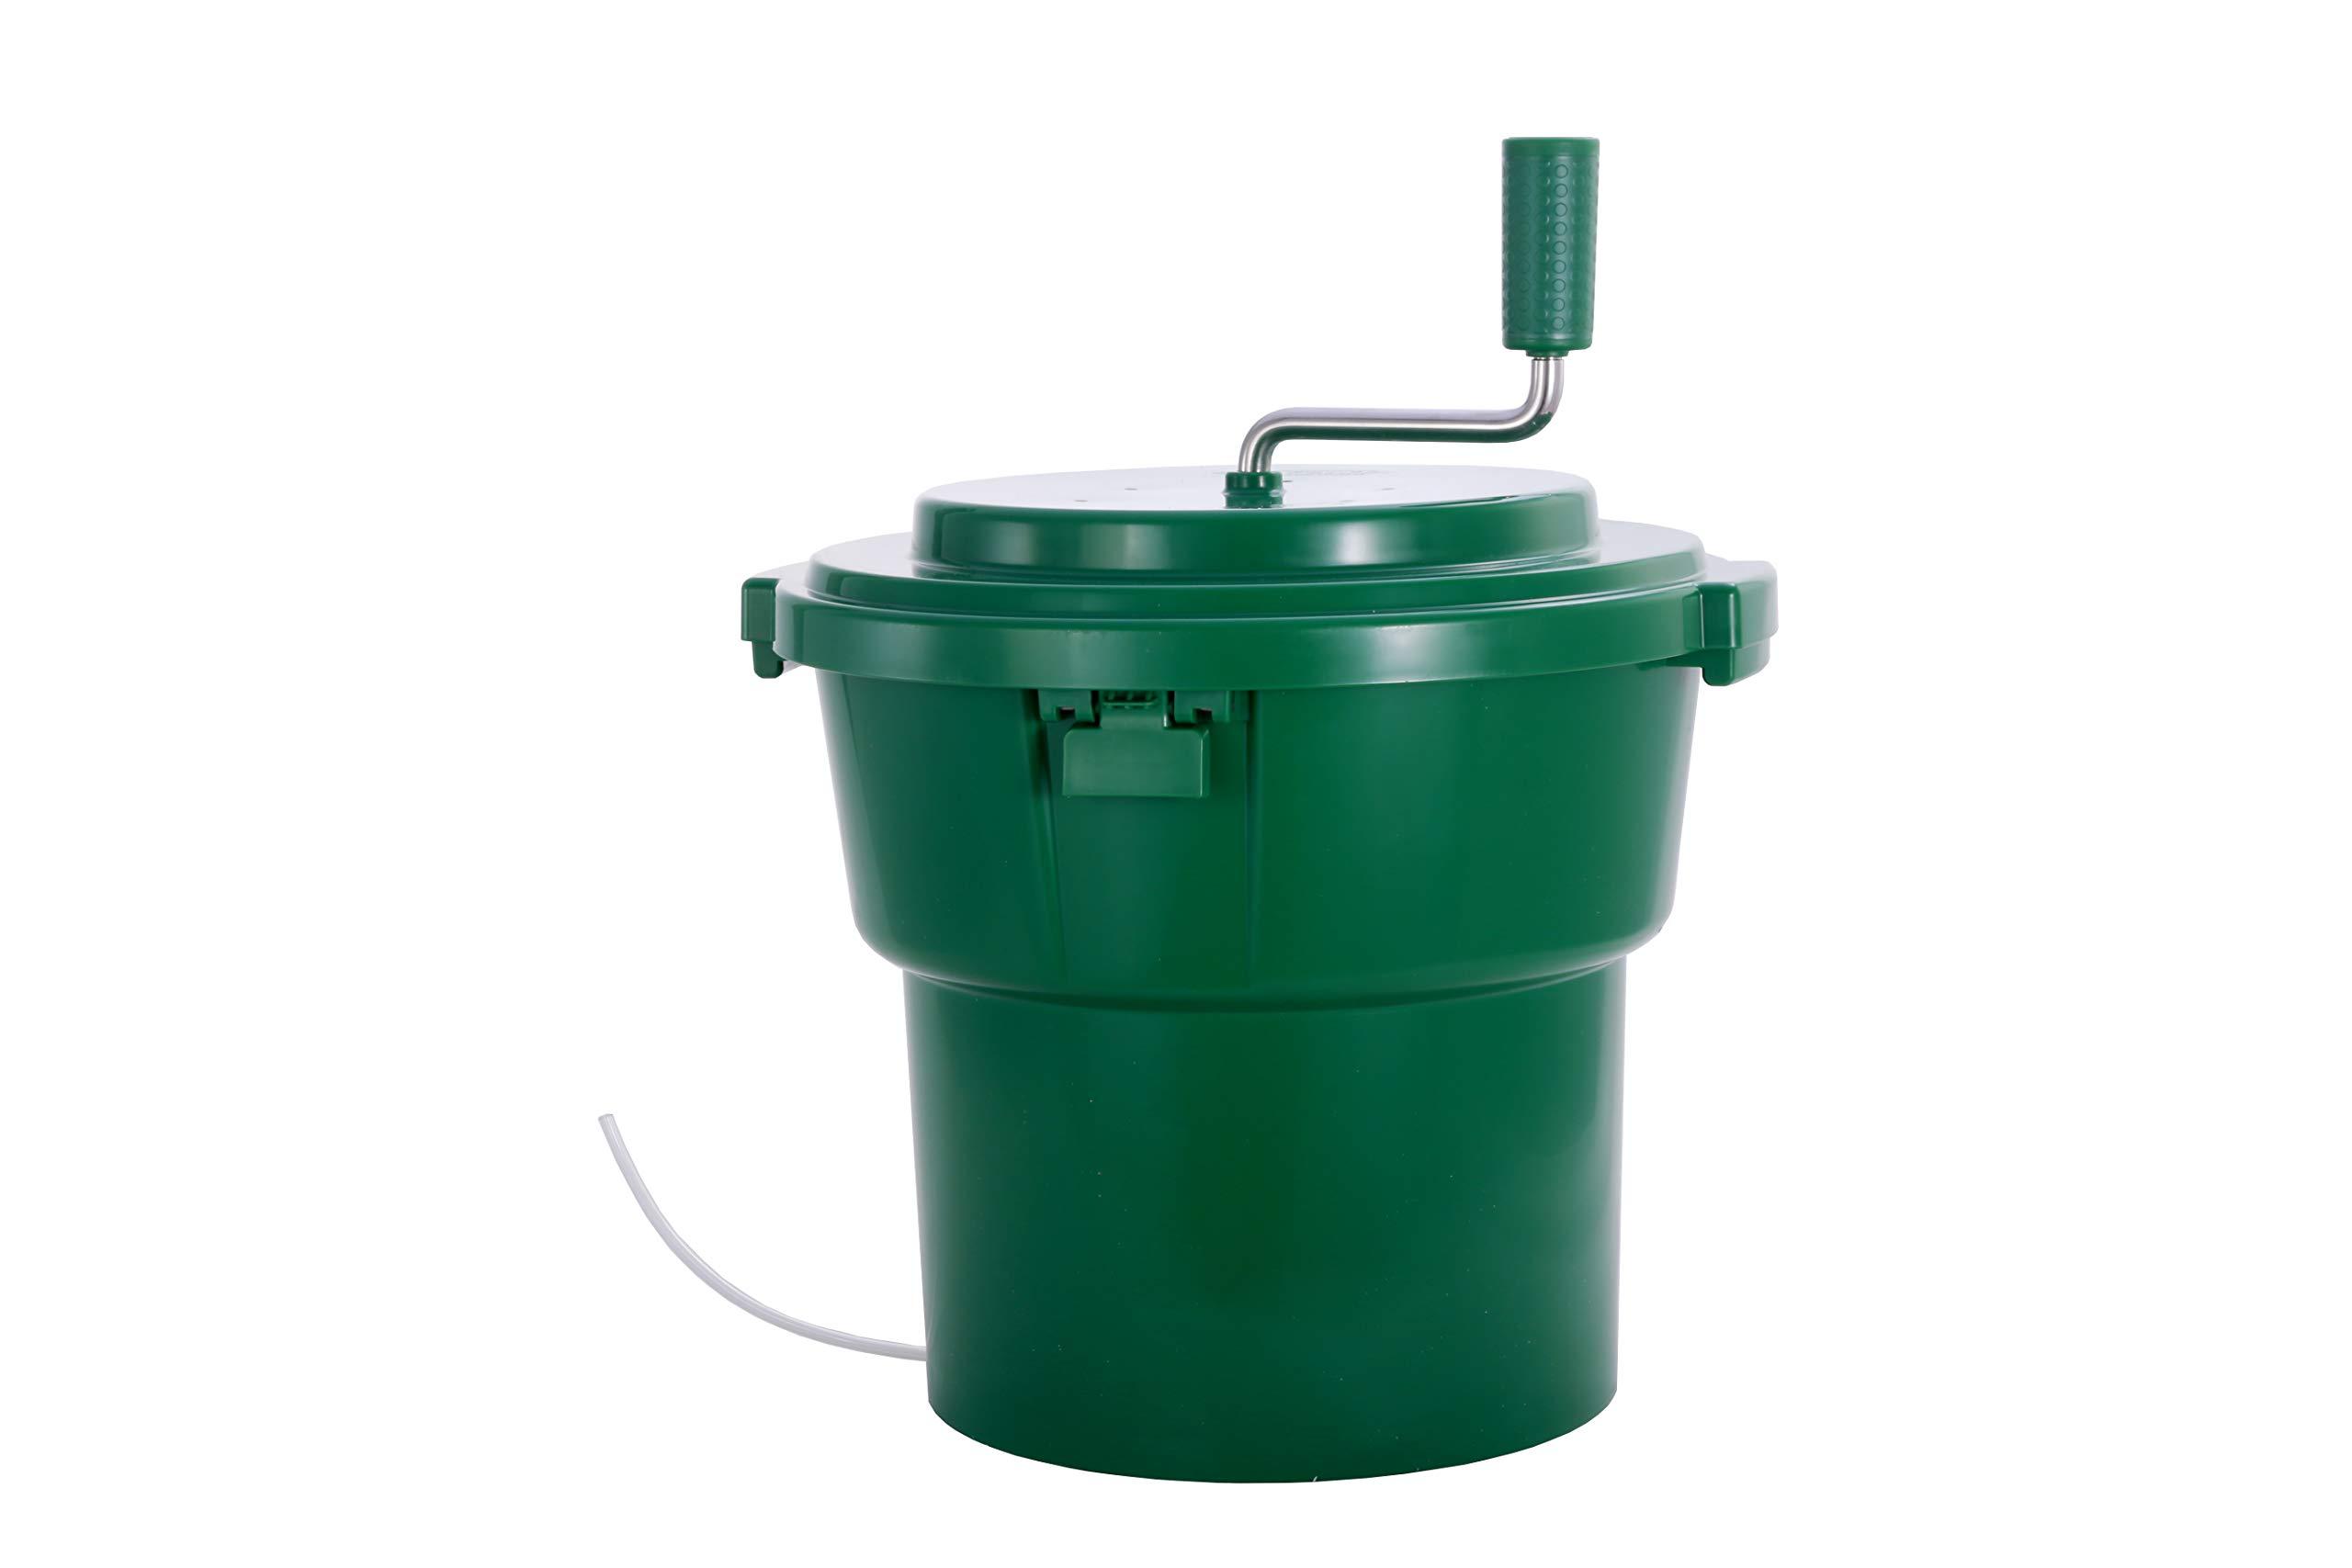 Hakka 20 Liter/5 Gallon Large Commercial Manual Salad Spinner&Dryer by HAKKA FOOD PROCESSING (Image #1)